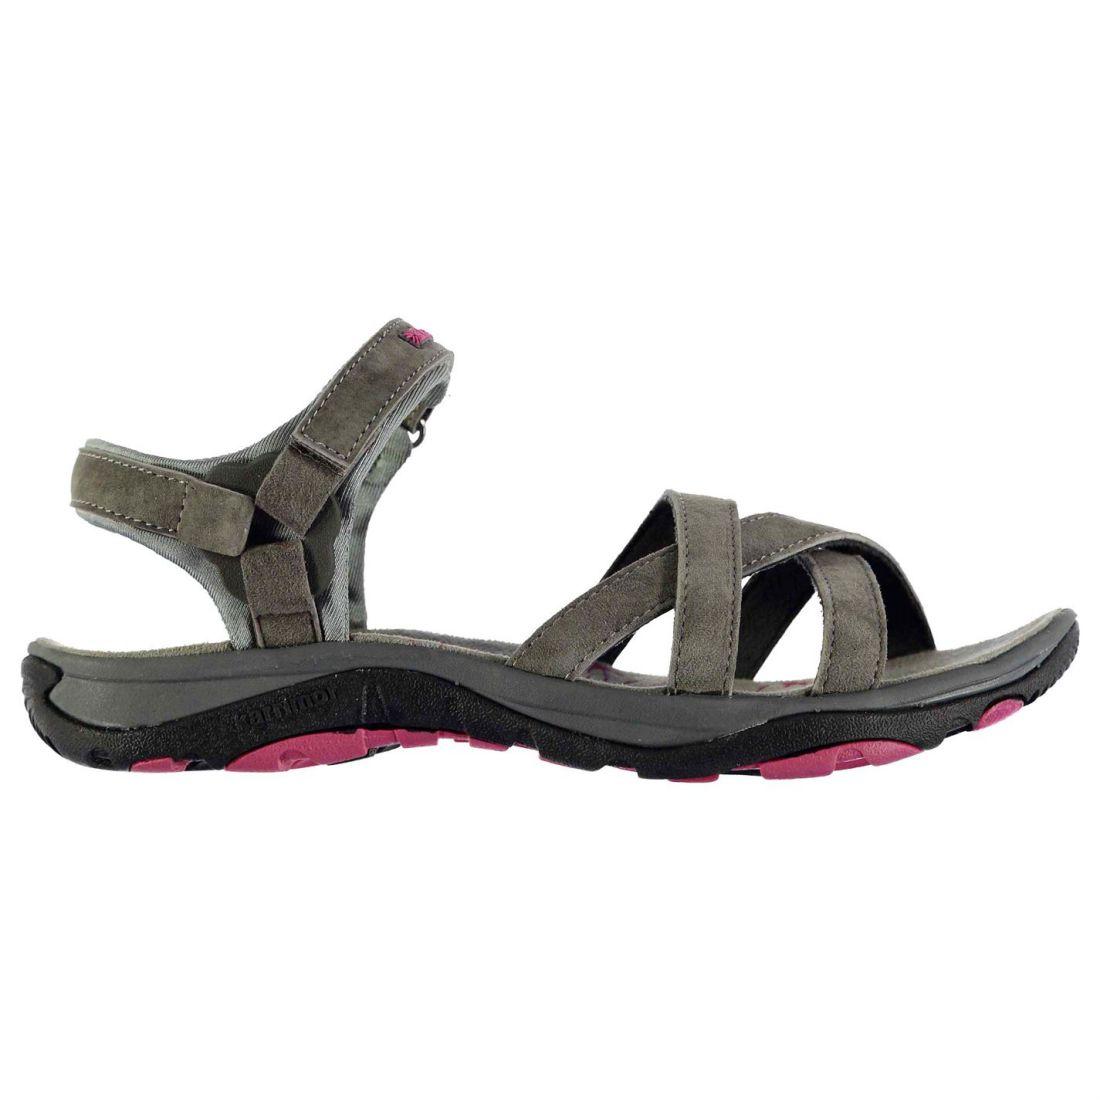 a76022e57fd0c Karrimor Ladies Salina Leather Walking Sandals Shoes Footwear